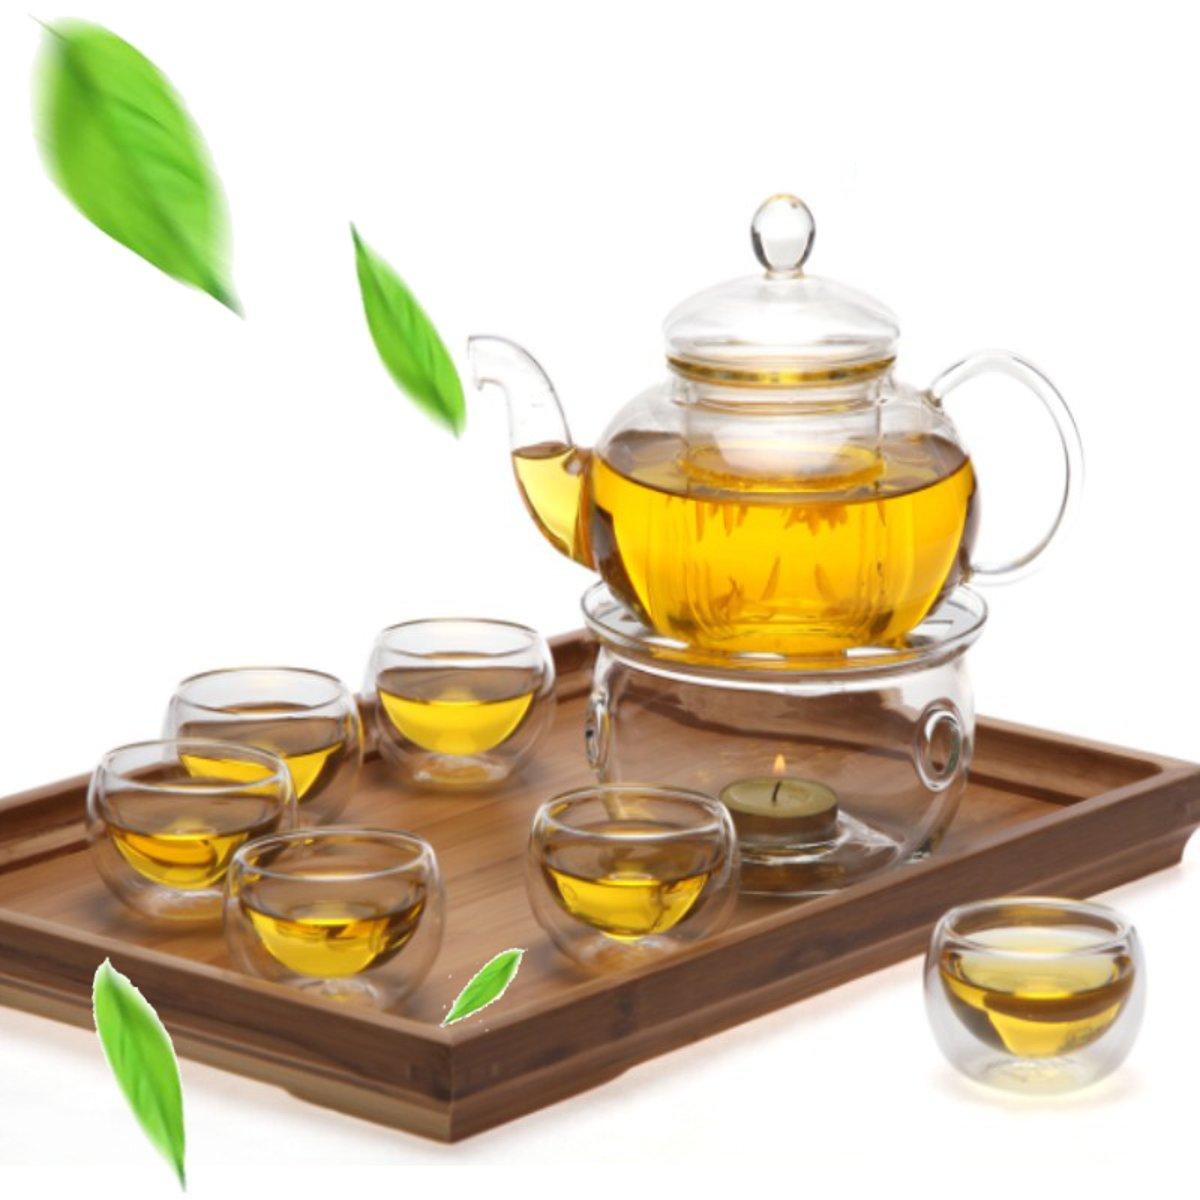 8 Pcs/Set Clear Glass Tea Double Wall Teapot & Cup Filtering Drink Home Decor Handmade Teapot Set Heat Resisting Warmer